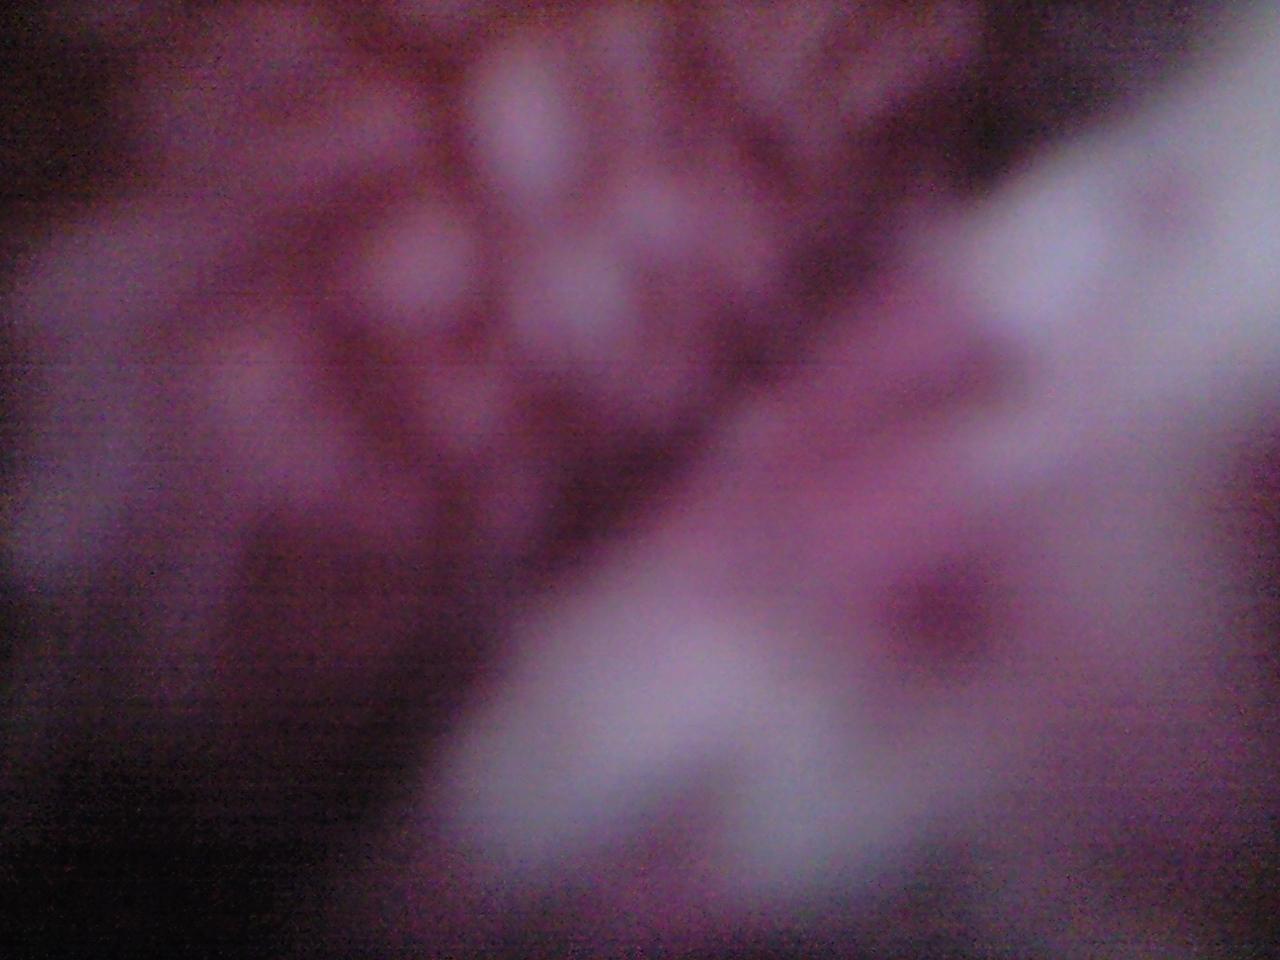 c0149285_19514717.jpg